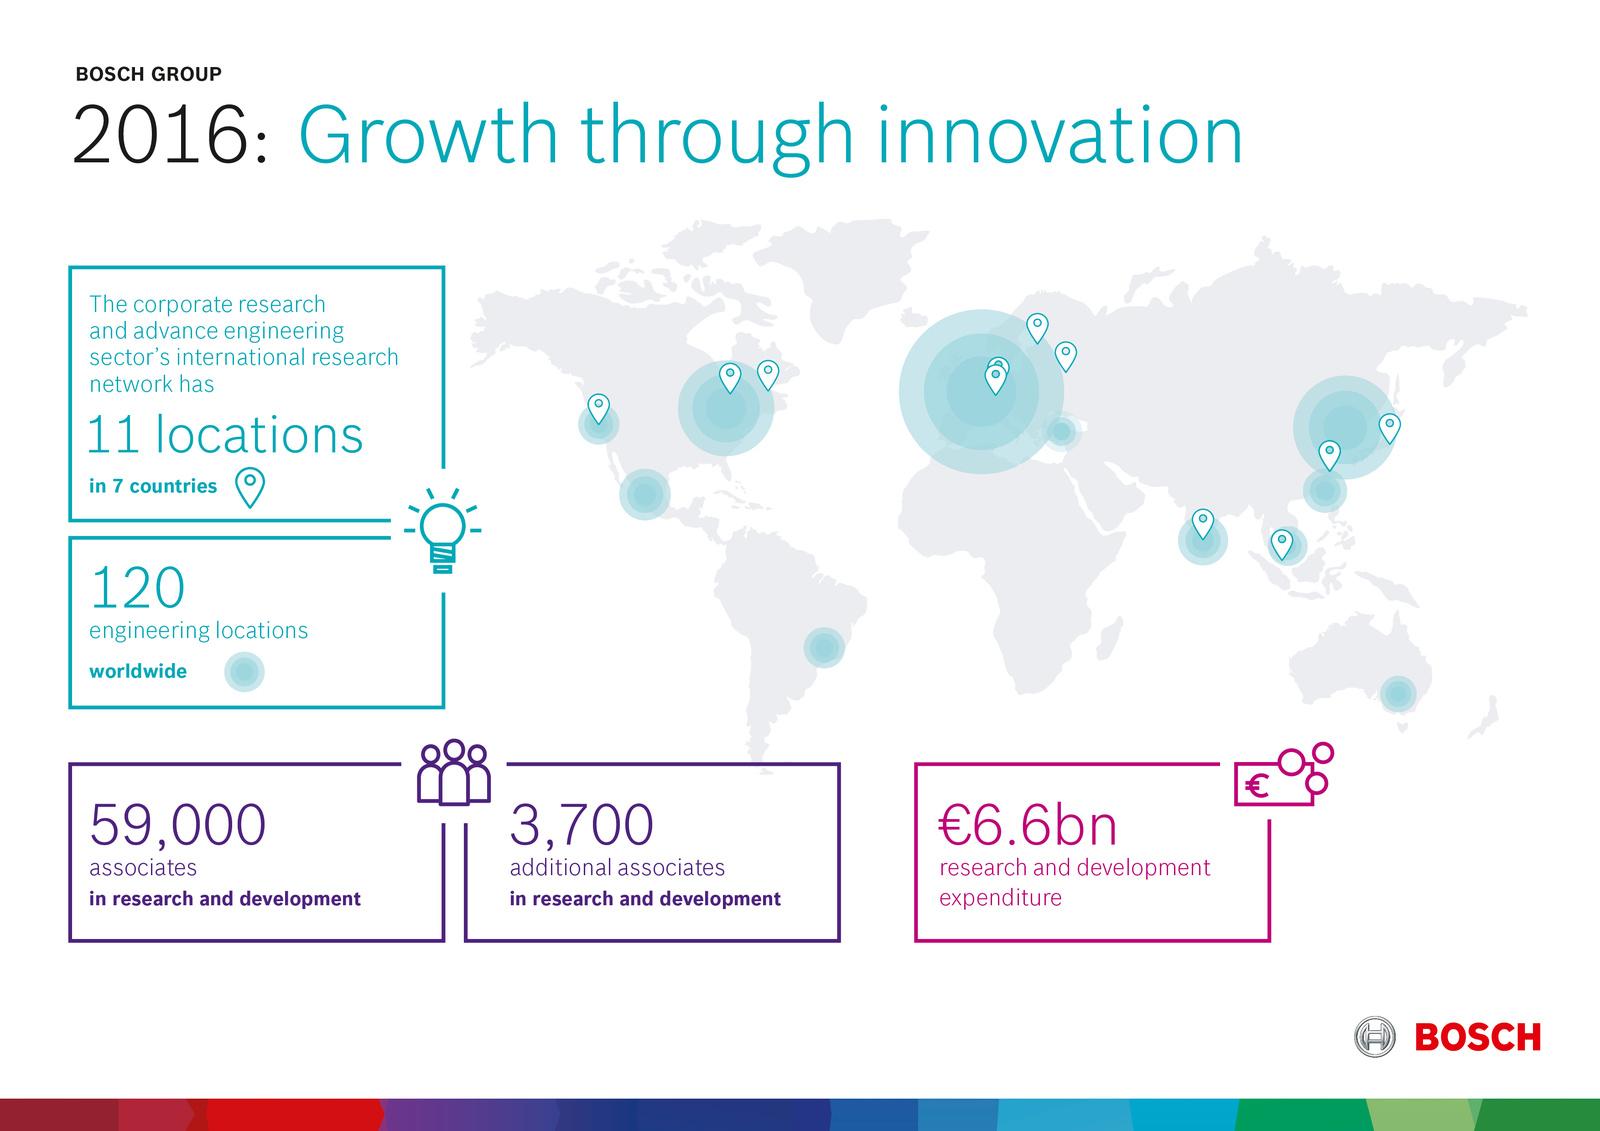 Preliminary key data 2016 Growth through innovation